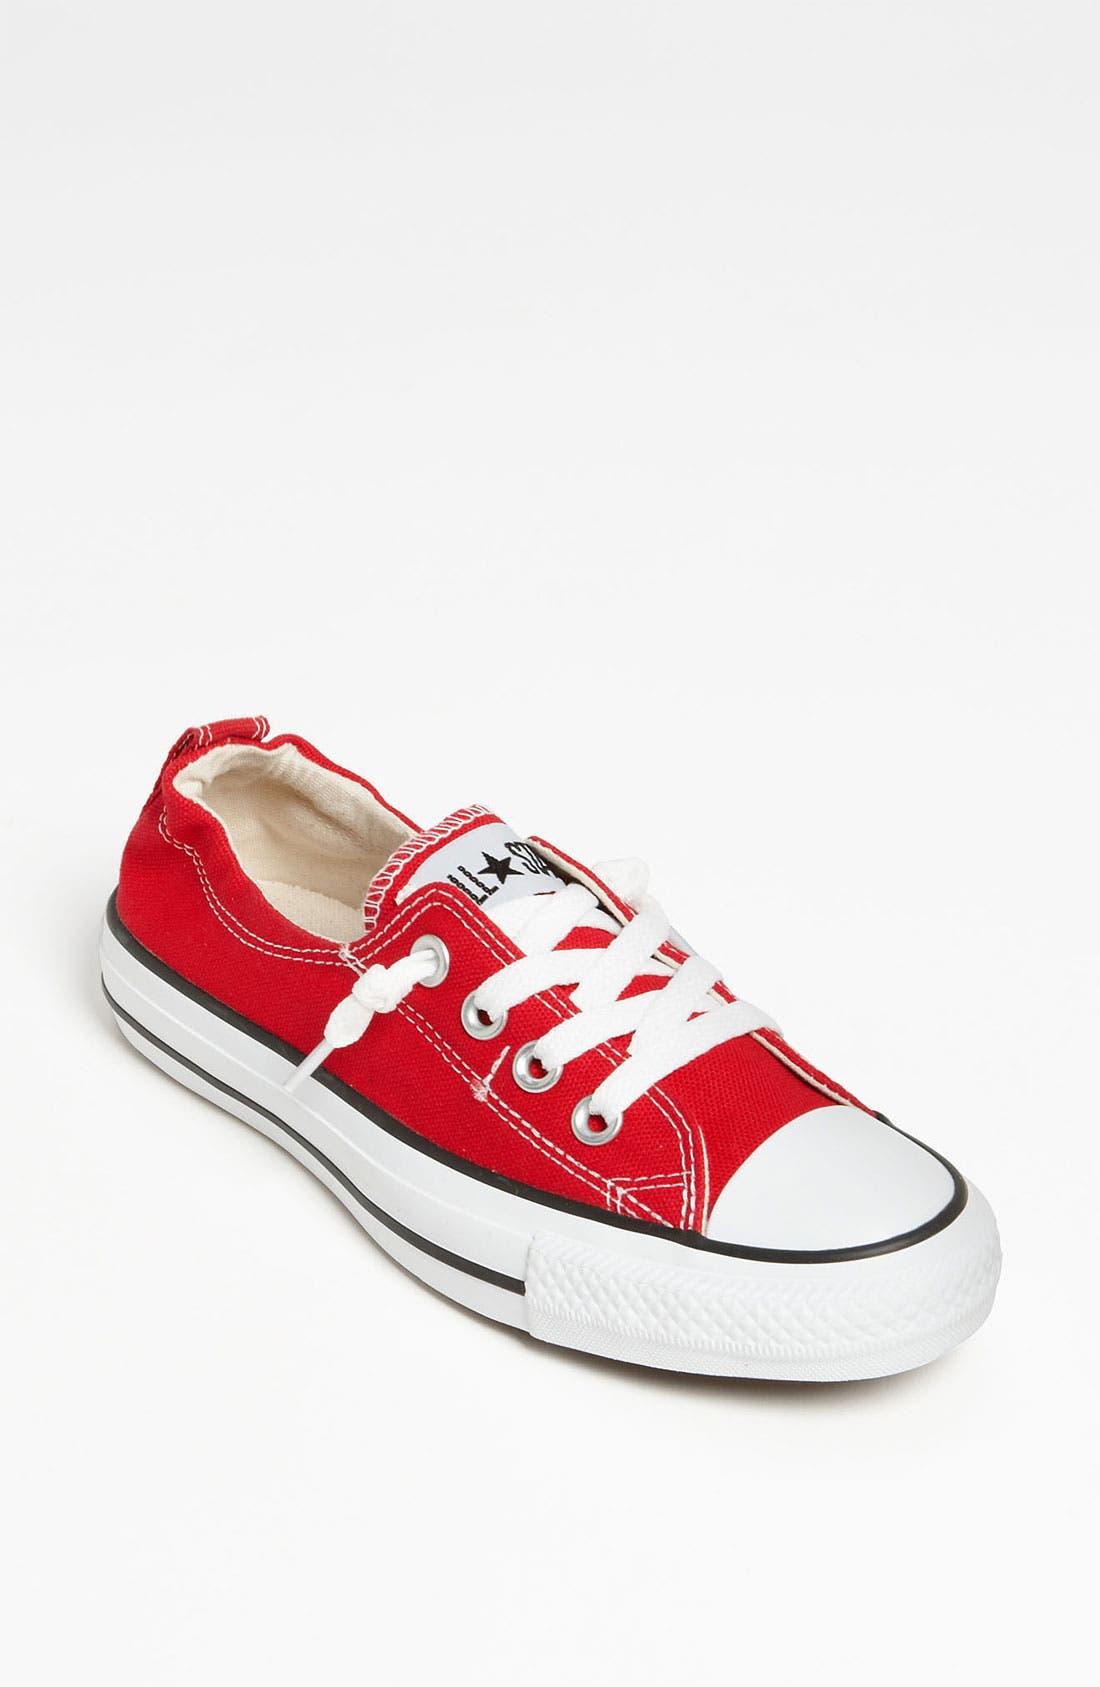 Alternate Image 1 Selected - Converse Chuck Taylor® Shoreline Sneaker (Women)